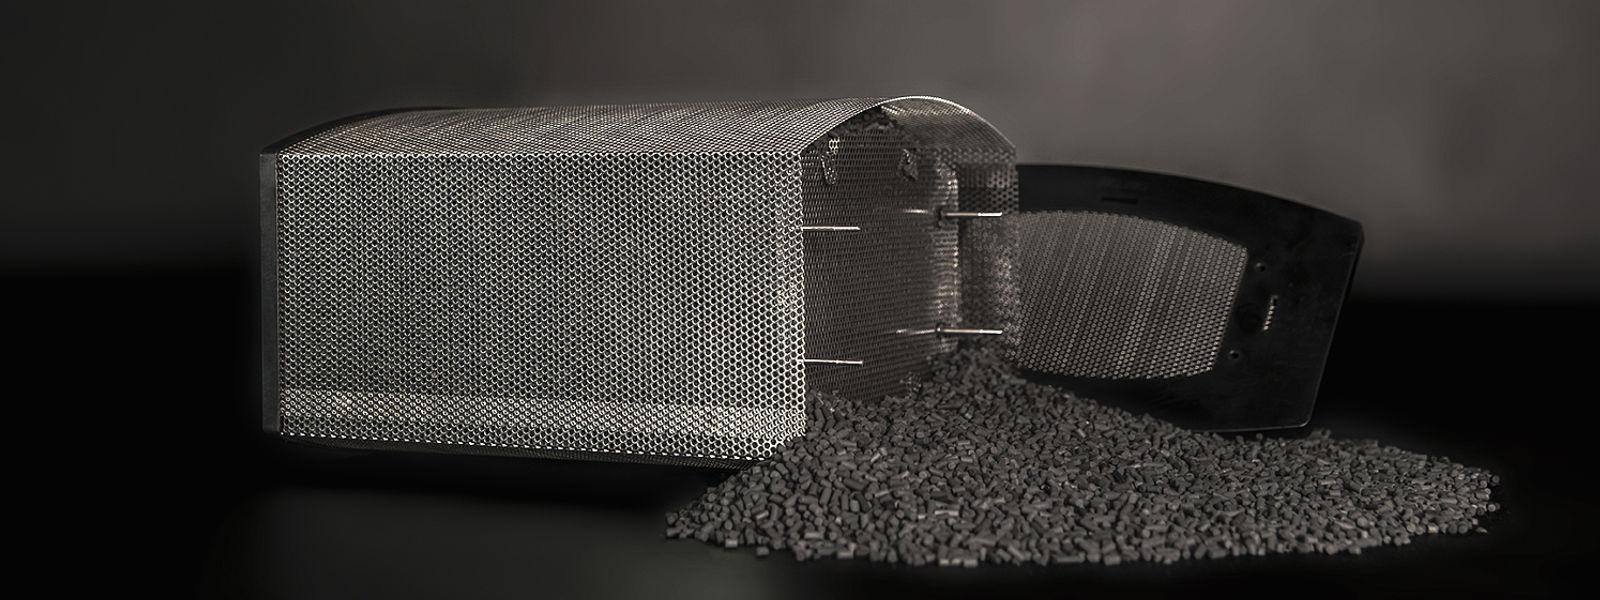 recirculation filter berbel ablufttechnik gmbh. Black Bedroom Furniture Sets. Home Design Ideas